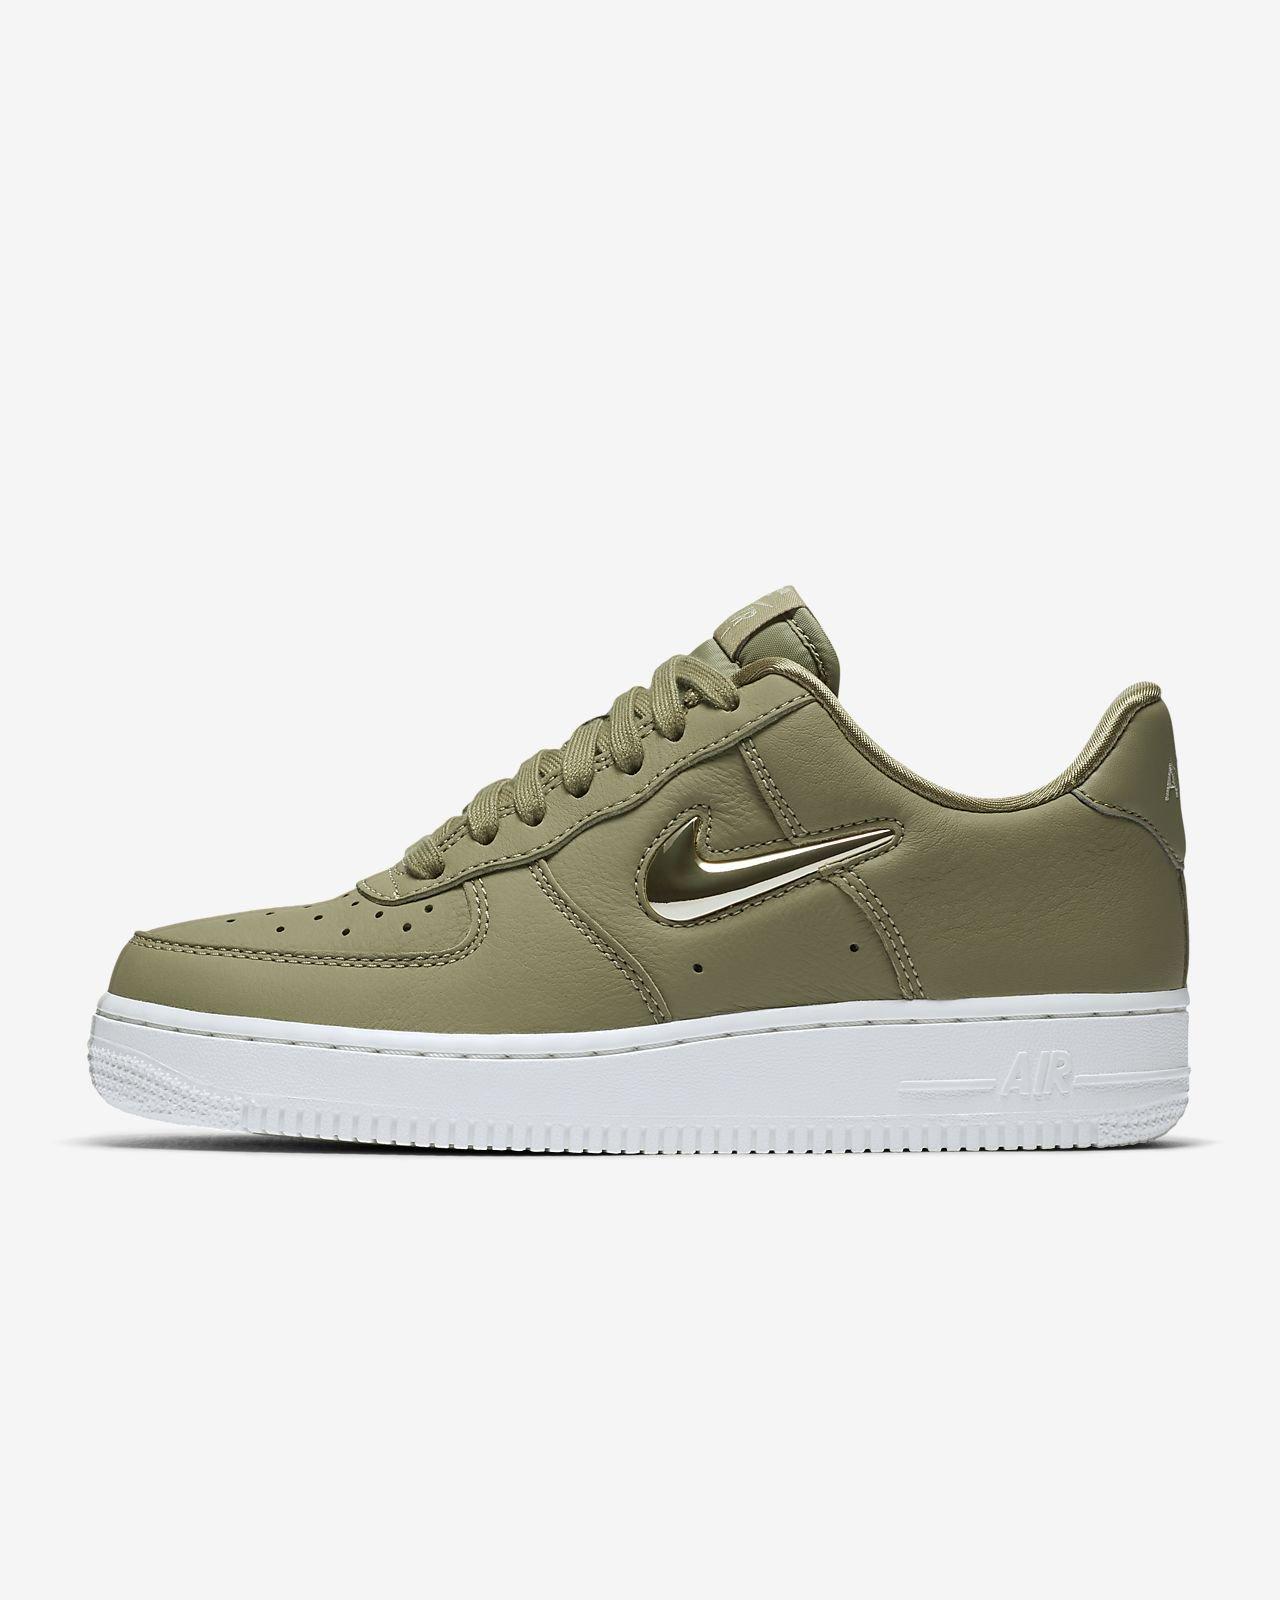 Nike Air Force 1 '07 Premium LX Women's Shoe. Nike.com